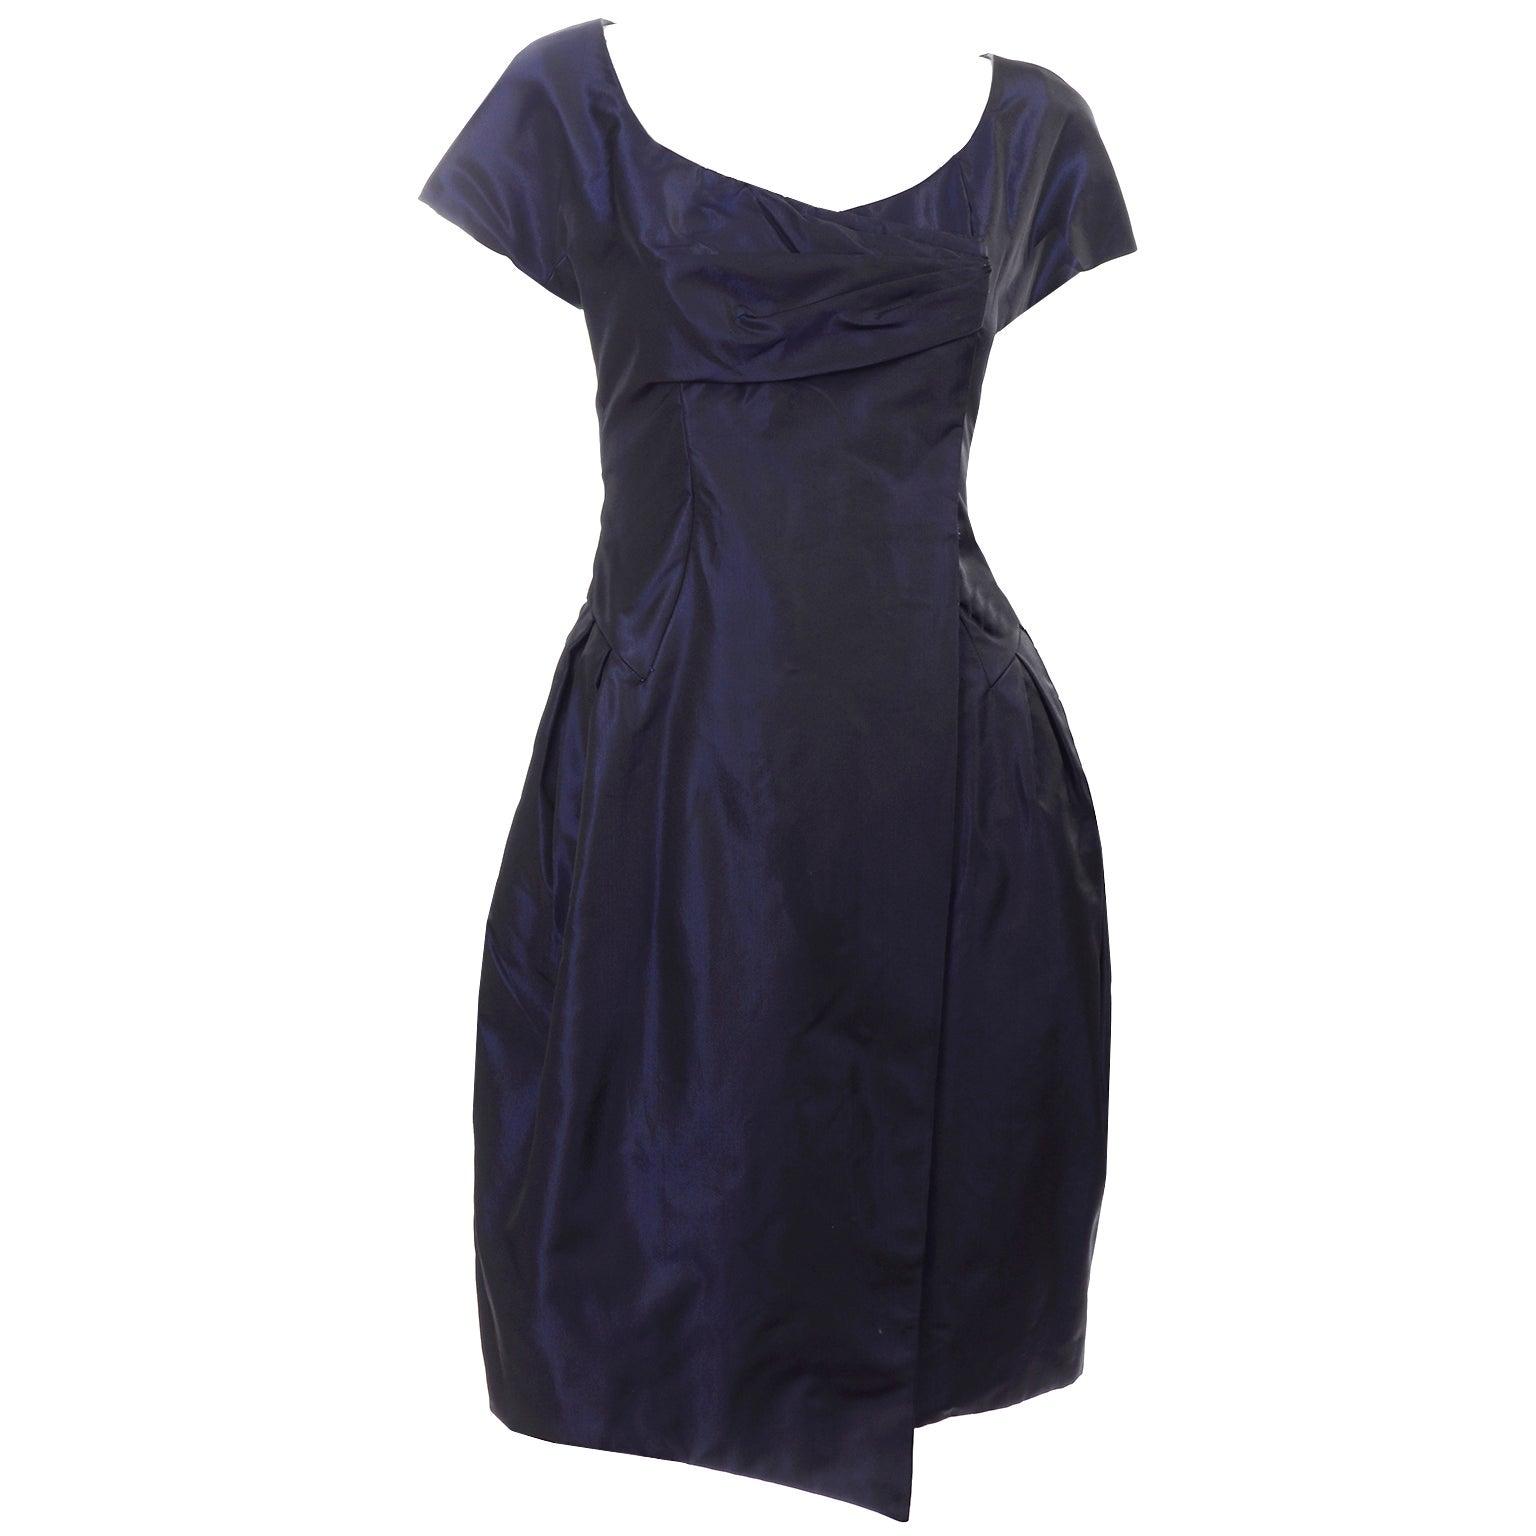 Christian Lacroix Vintage Midnight Blue Silk Evening Dress